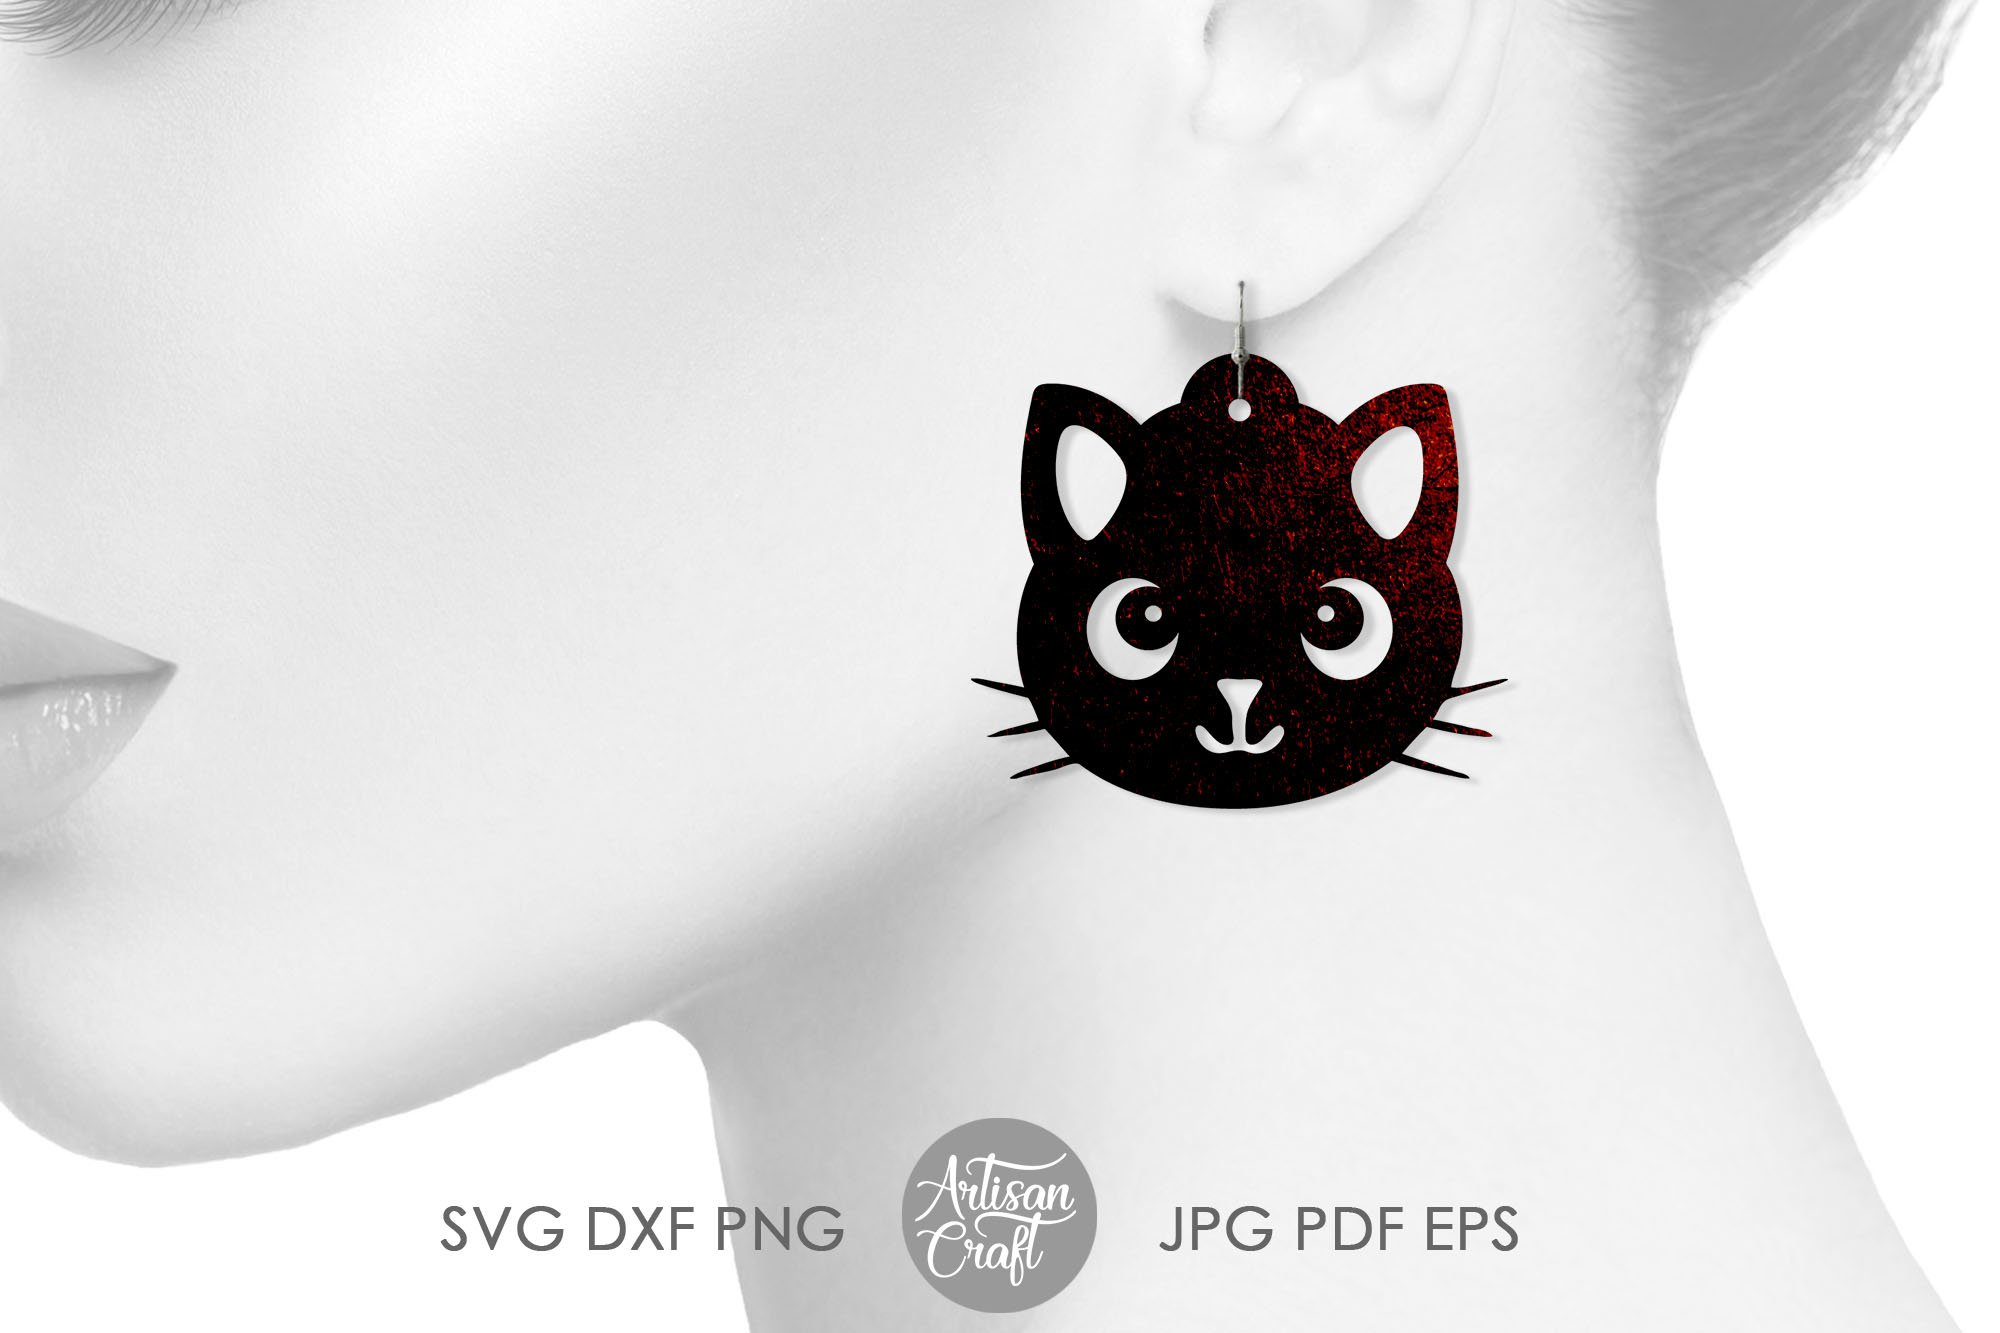 Cat earrings, svg, earrings for kids, cute cat earrings example image 5